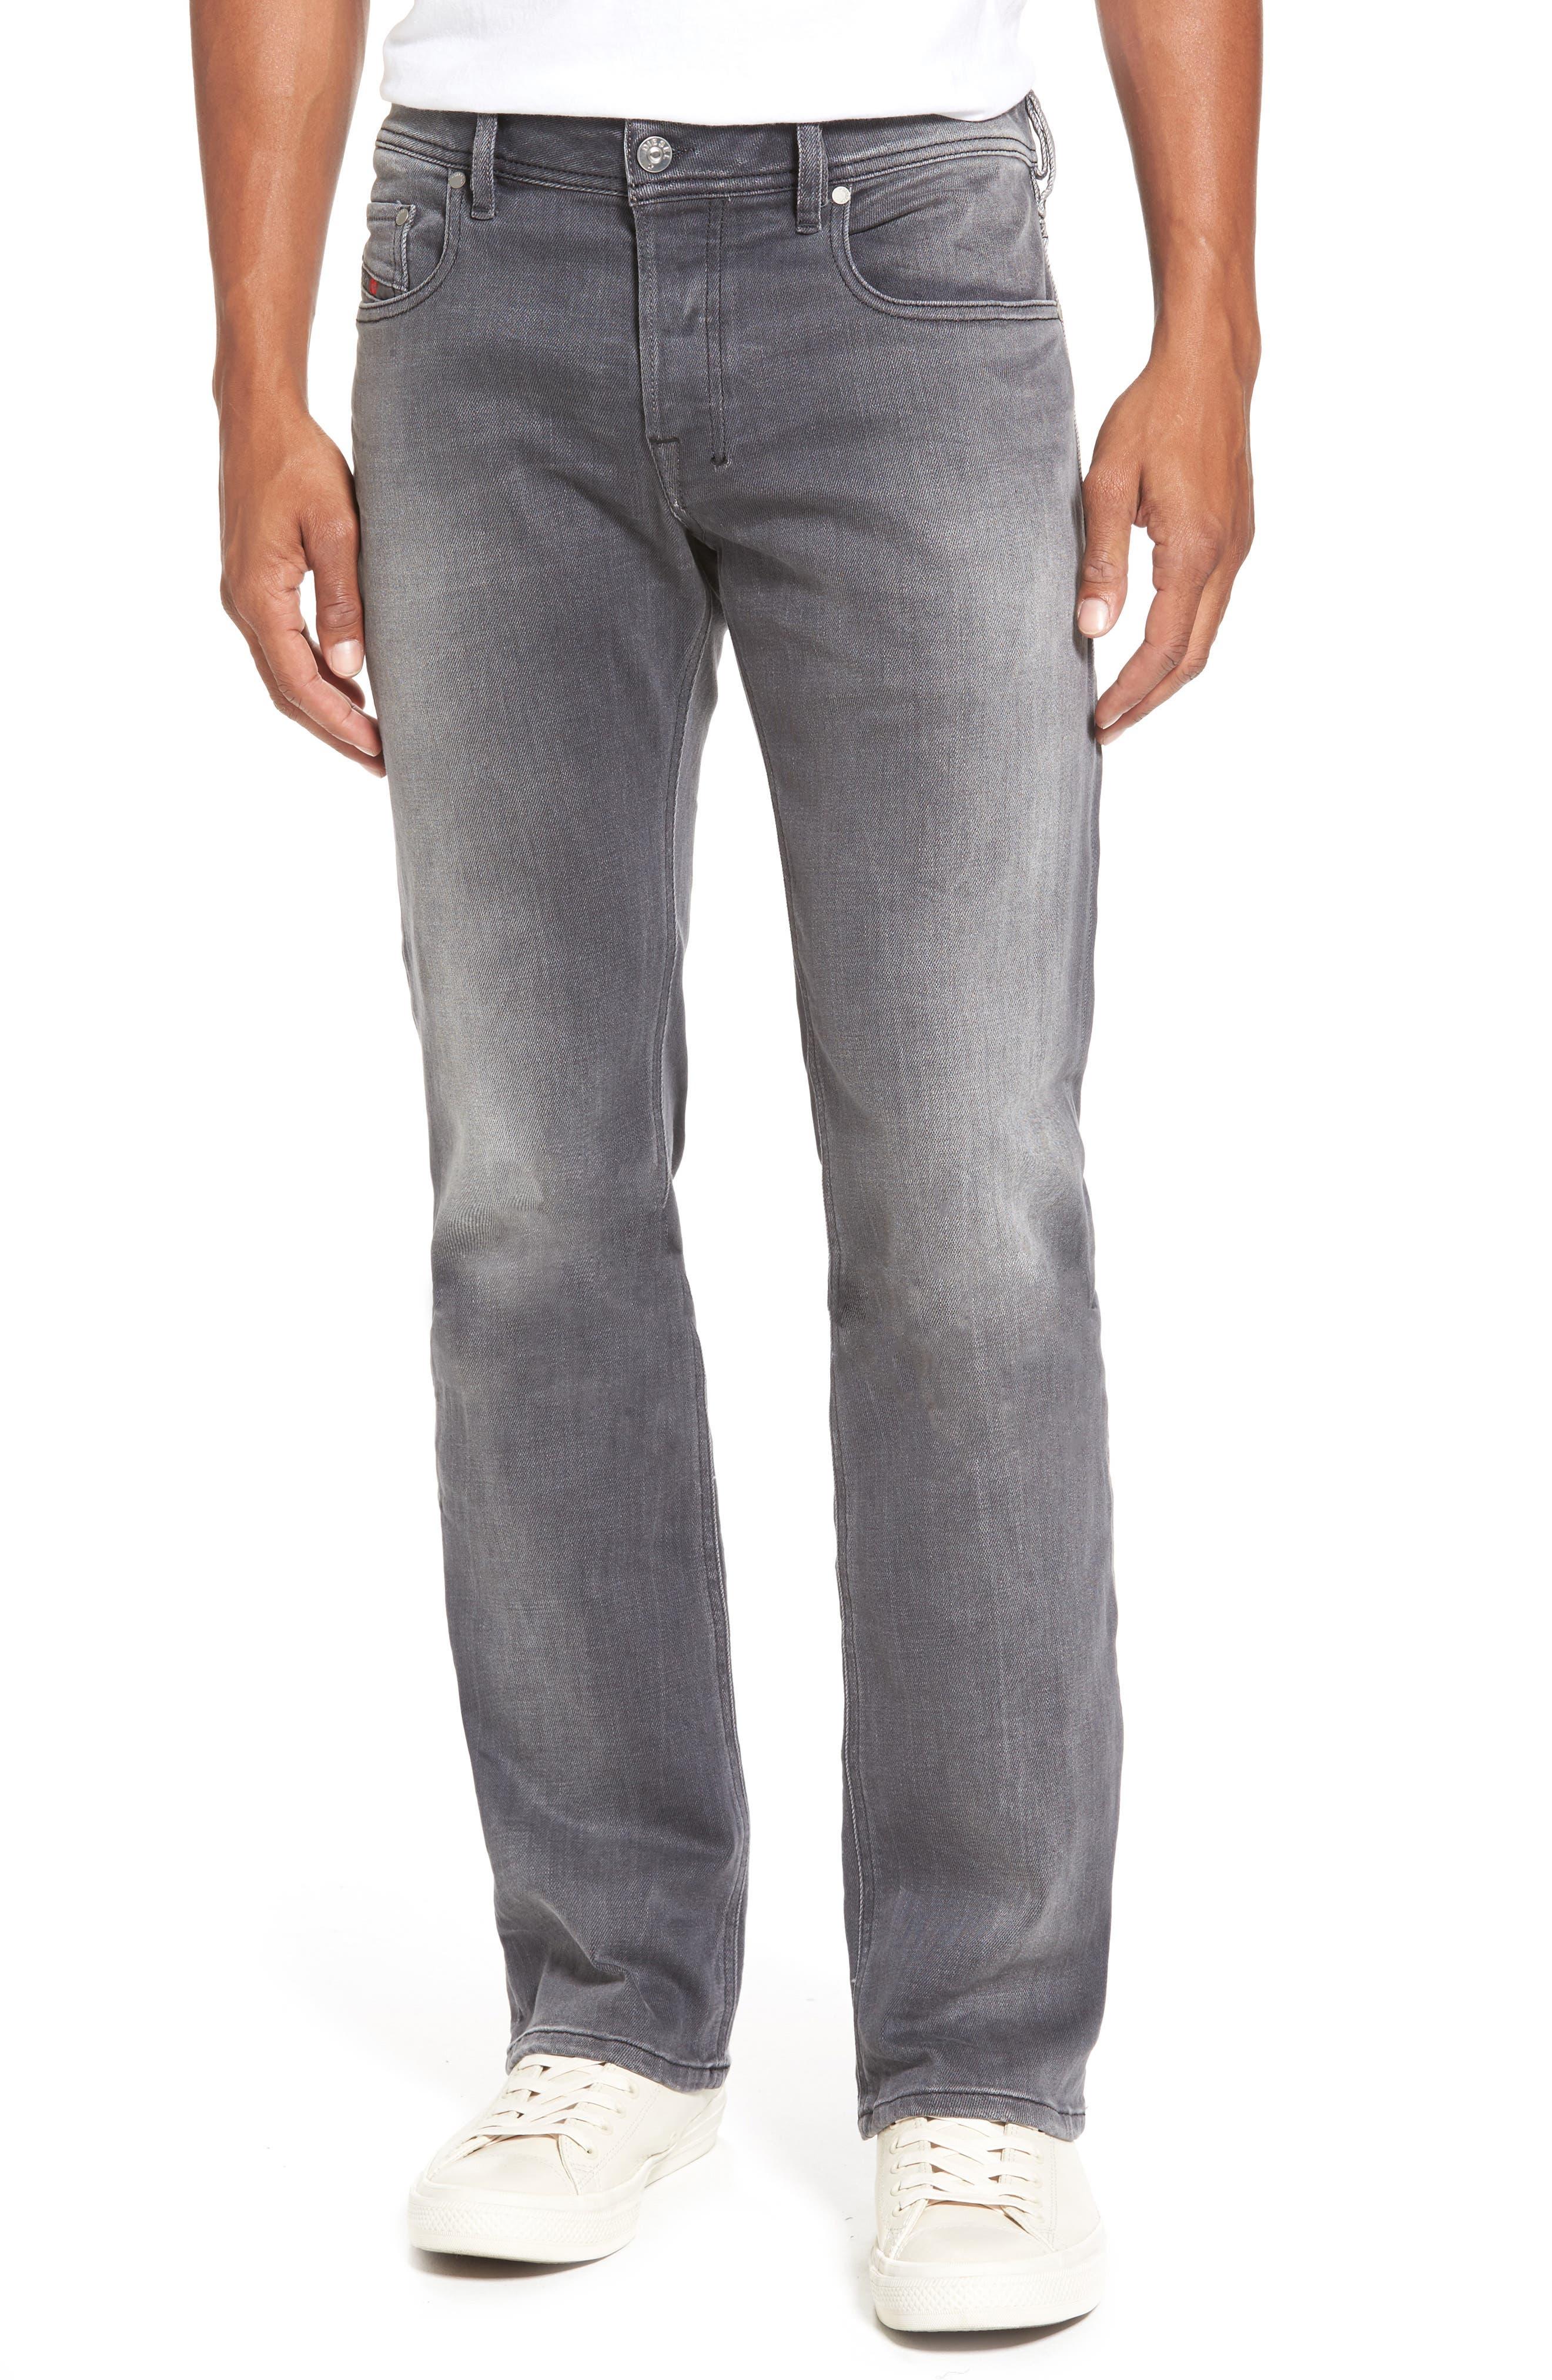 Alternate Image 1 Selected - DIESEL® Zatiny Bootcut Jeans (84JK)